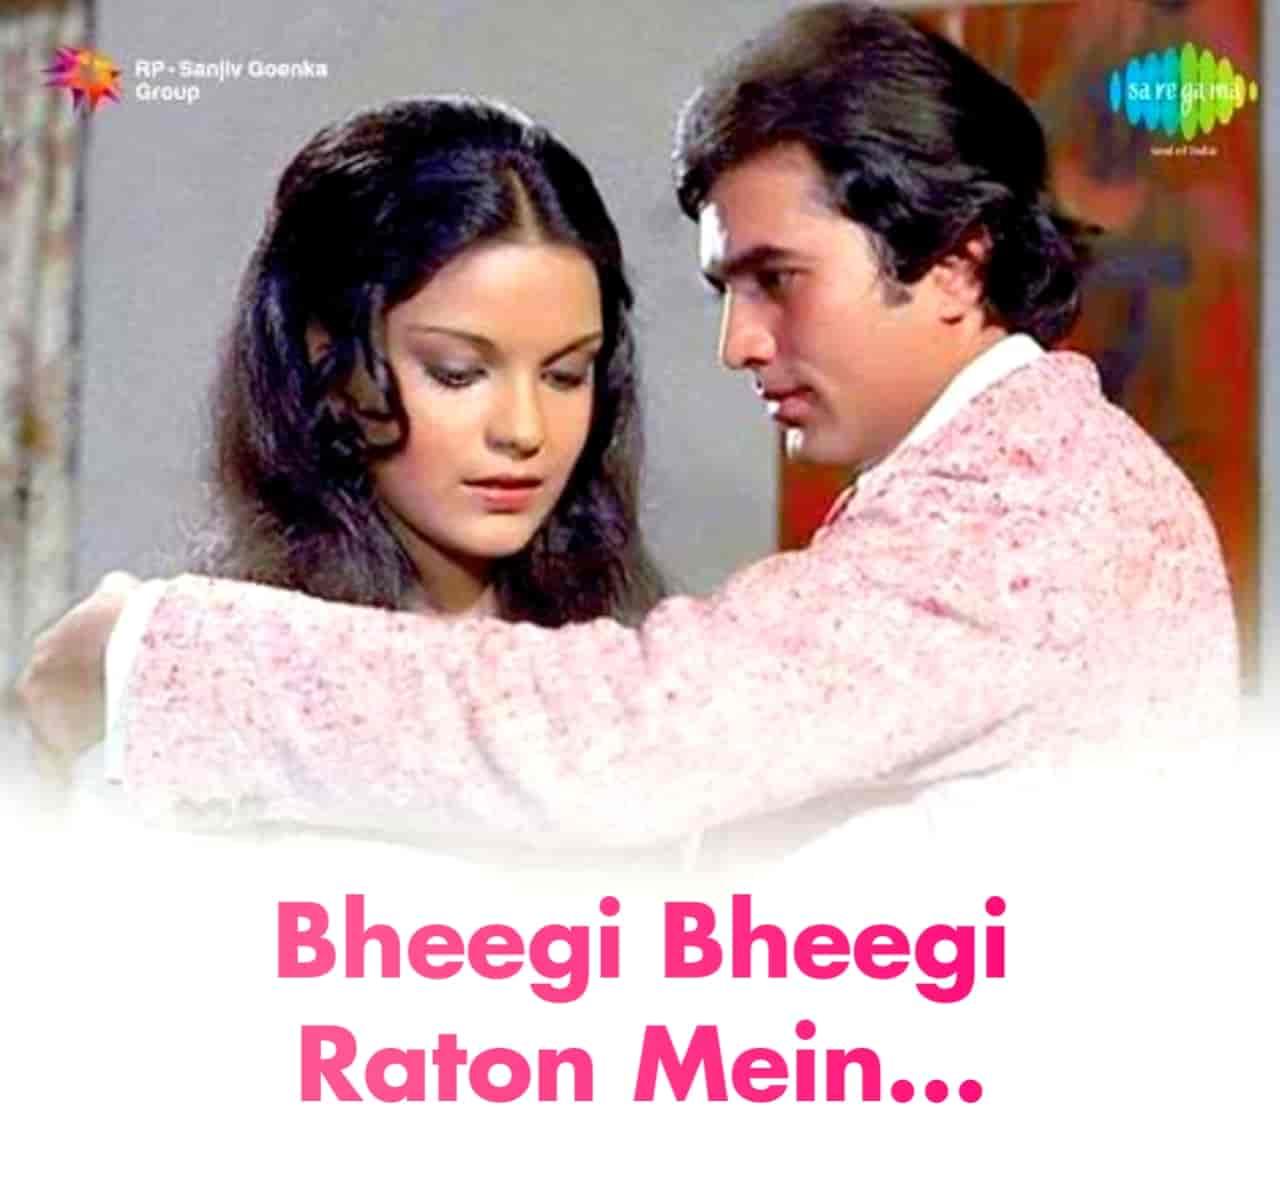 Bheegi Bheegi Raton Mein Hindi Romantic Song Lyrics, Sung By Kishor Kumar & Lata Mangeshkar.